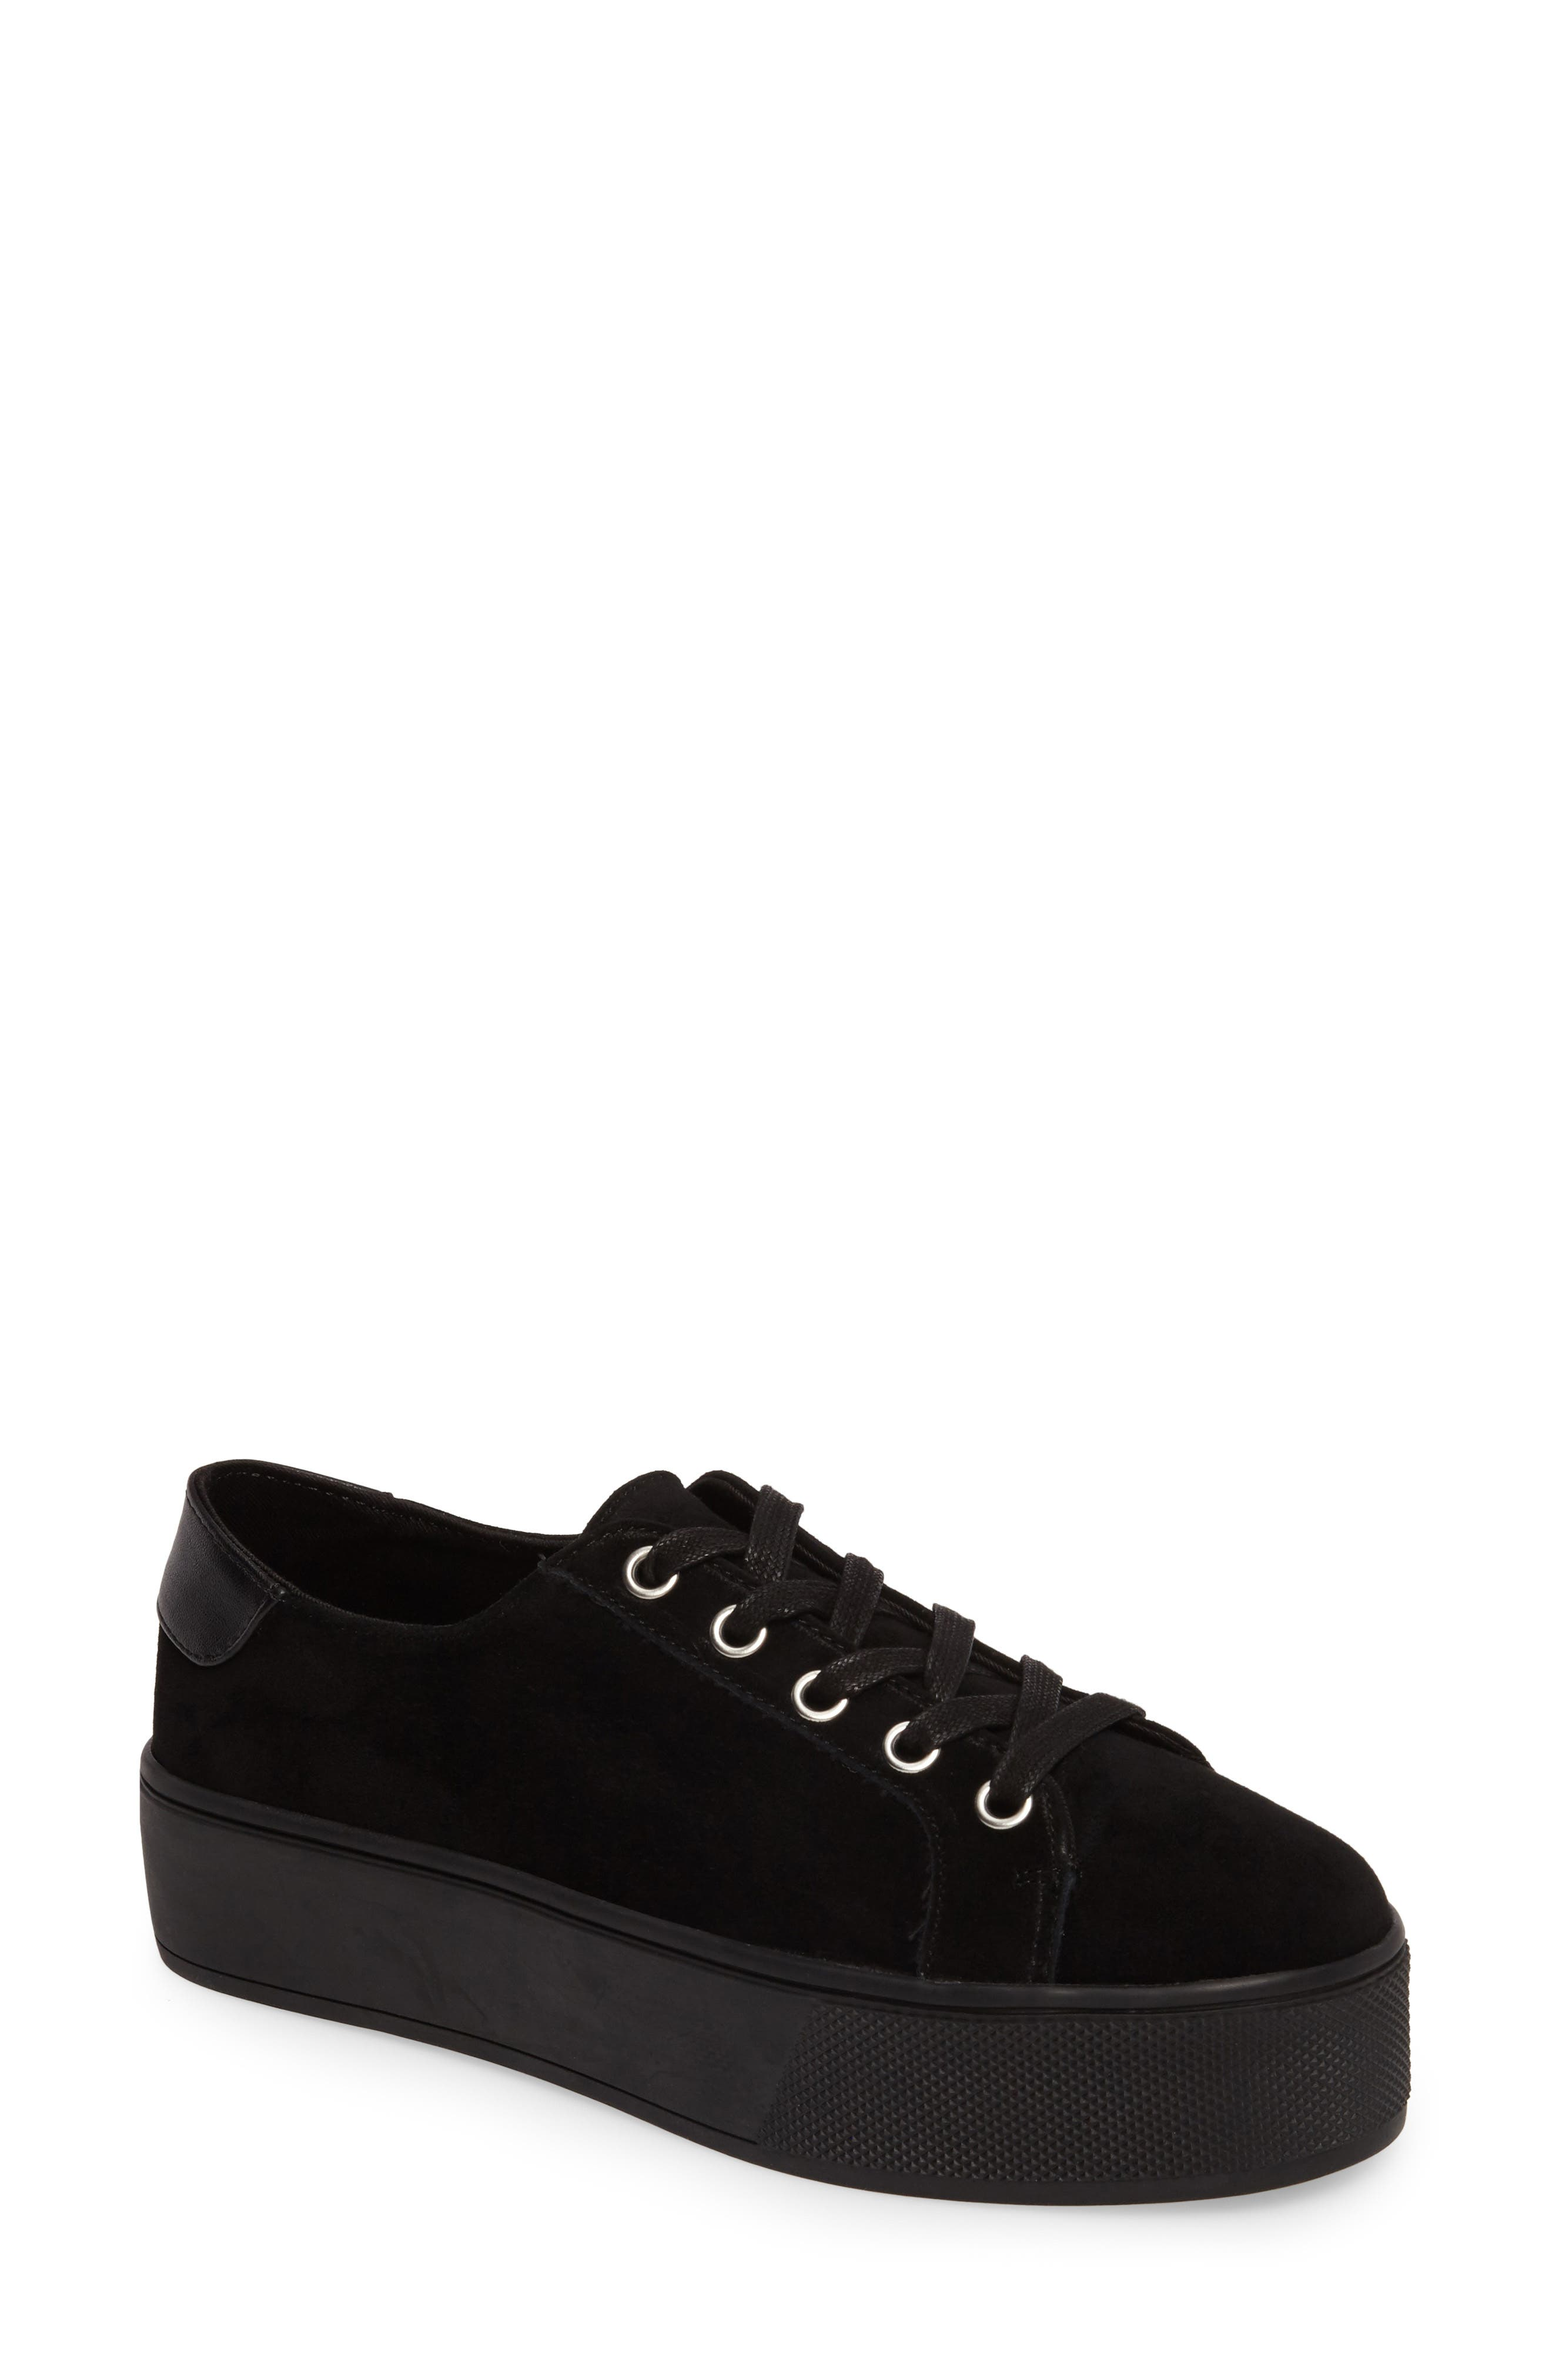 Felecia Platform Sneaker,                             Main thumbnail 1, color,                             Black Suede